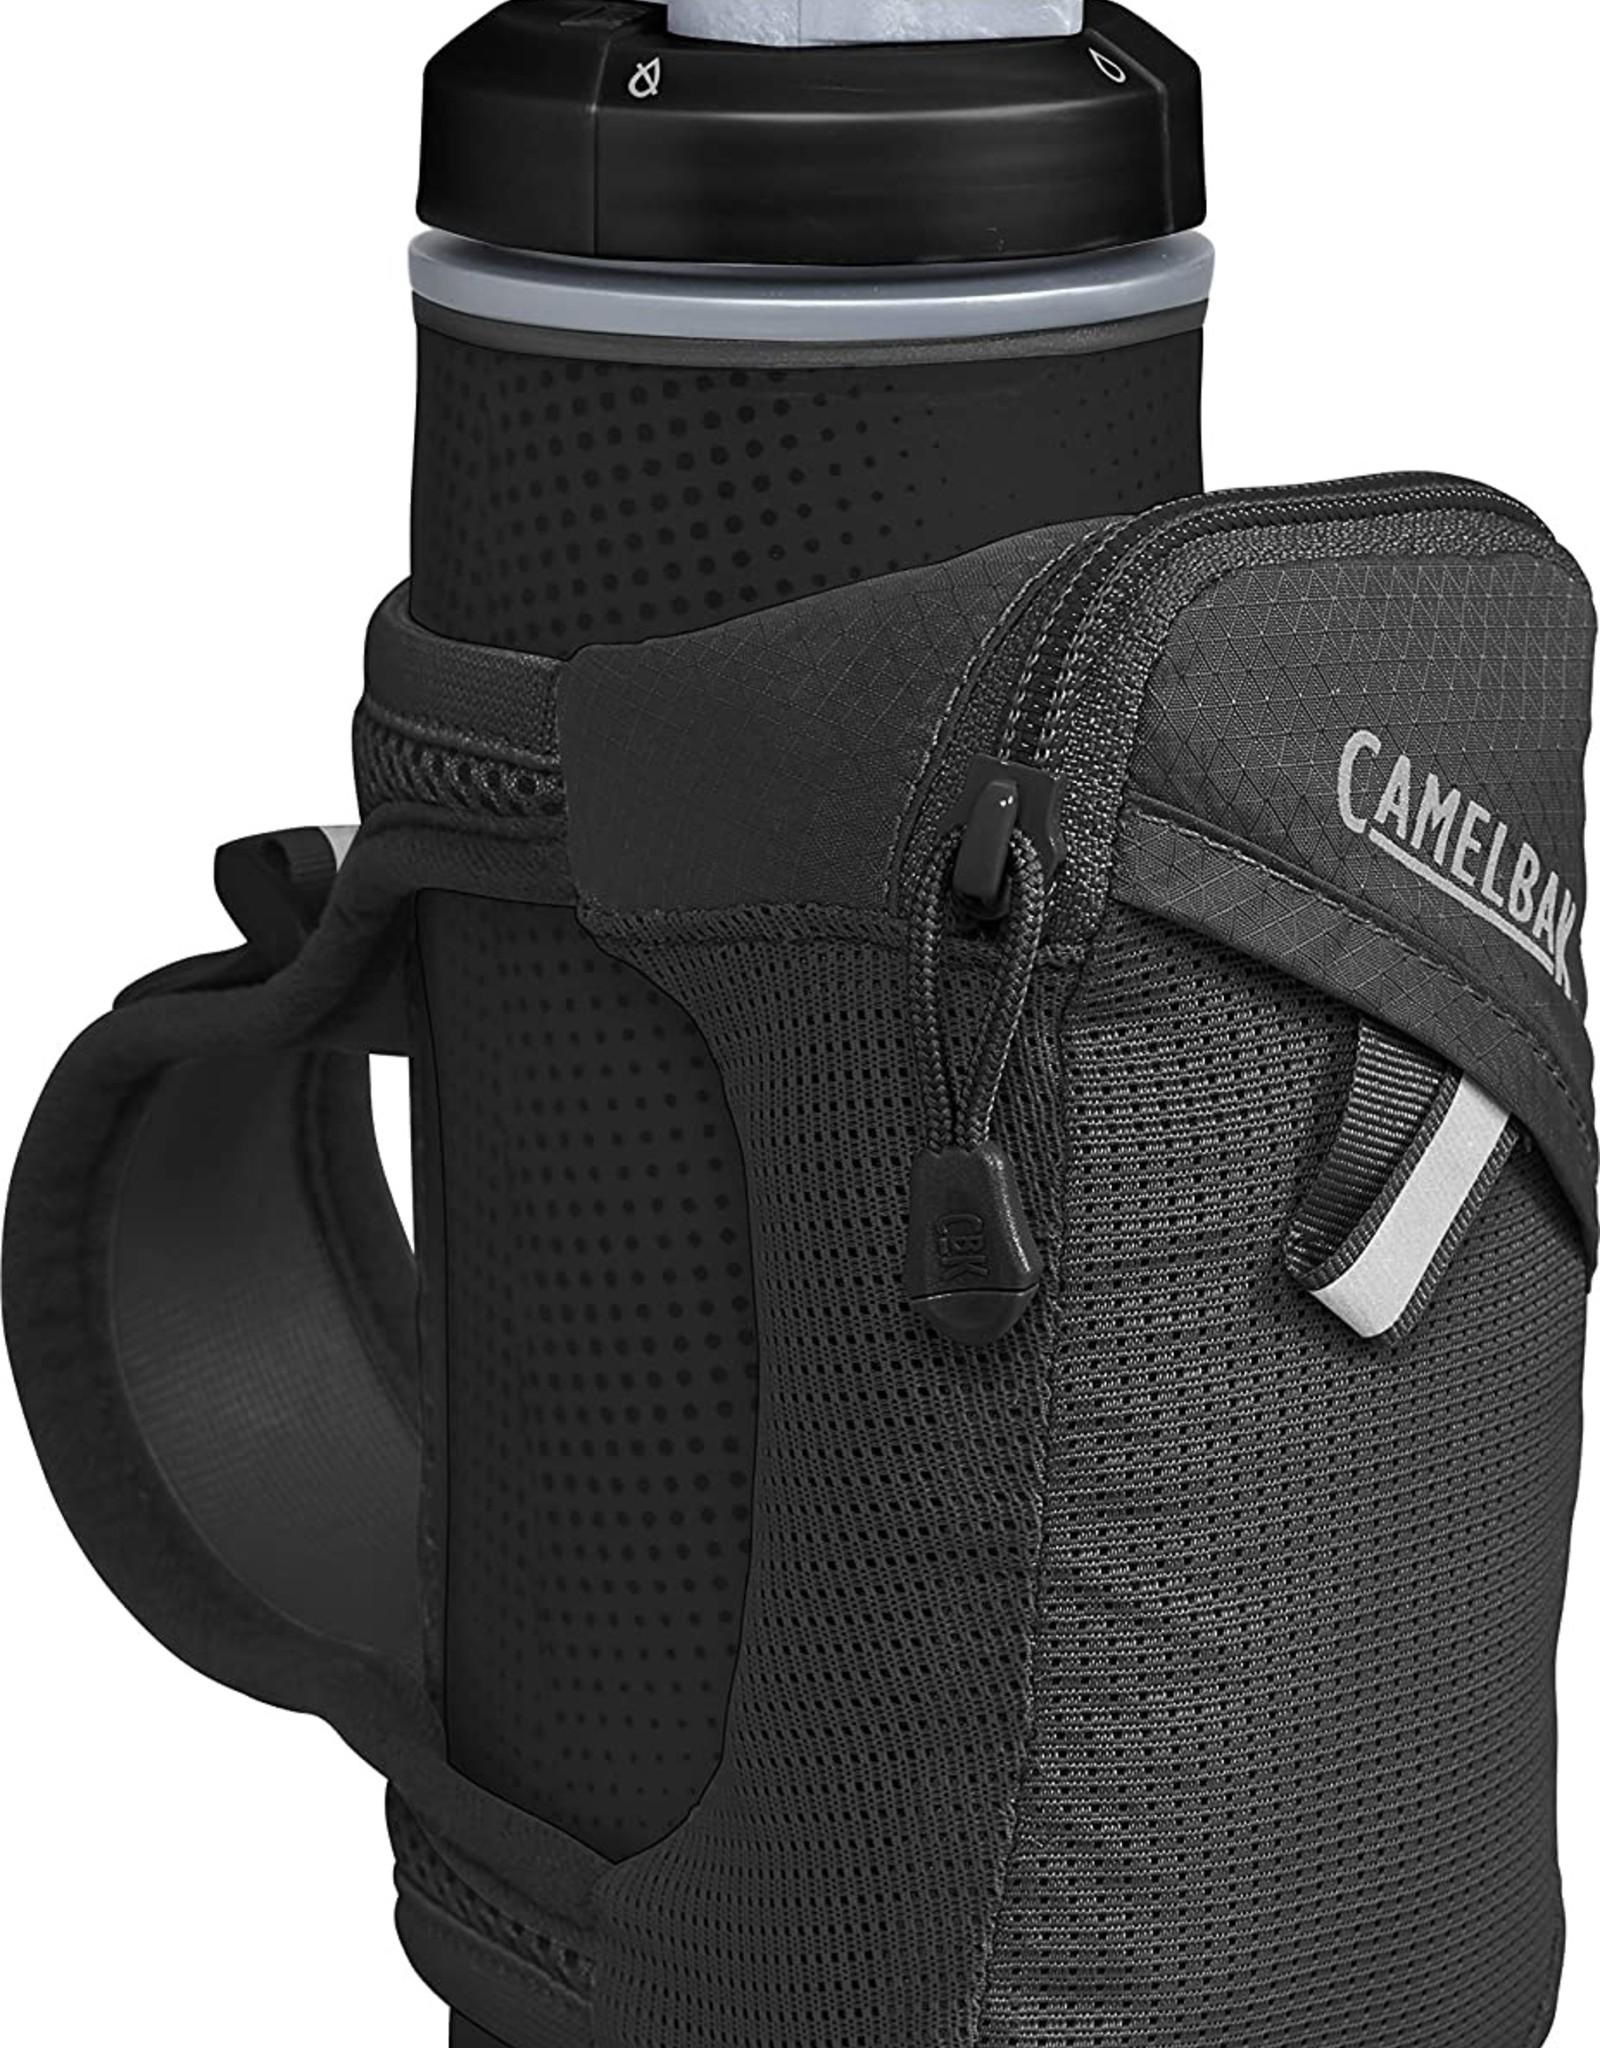 Camelbak Camelbak Quick Grip Chill Handheld 17oz